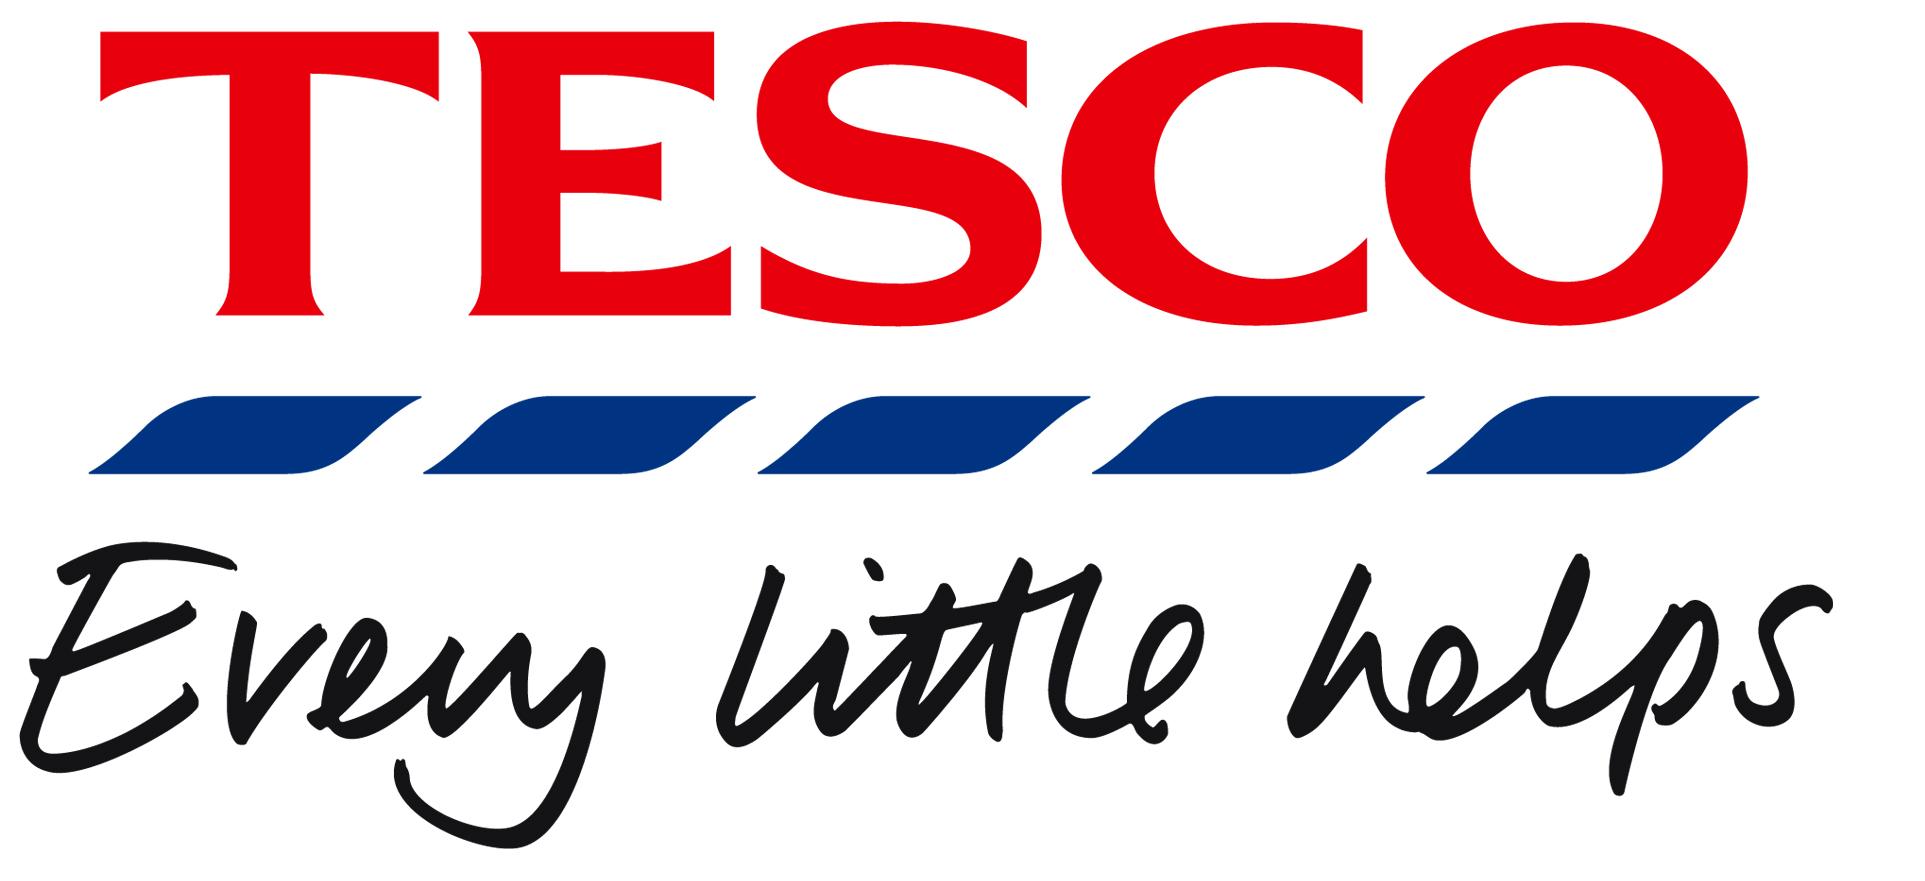 Tesco food love stories